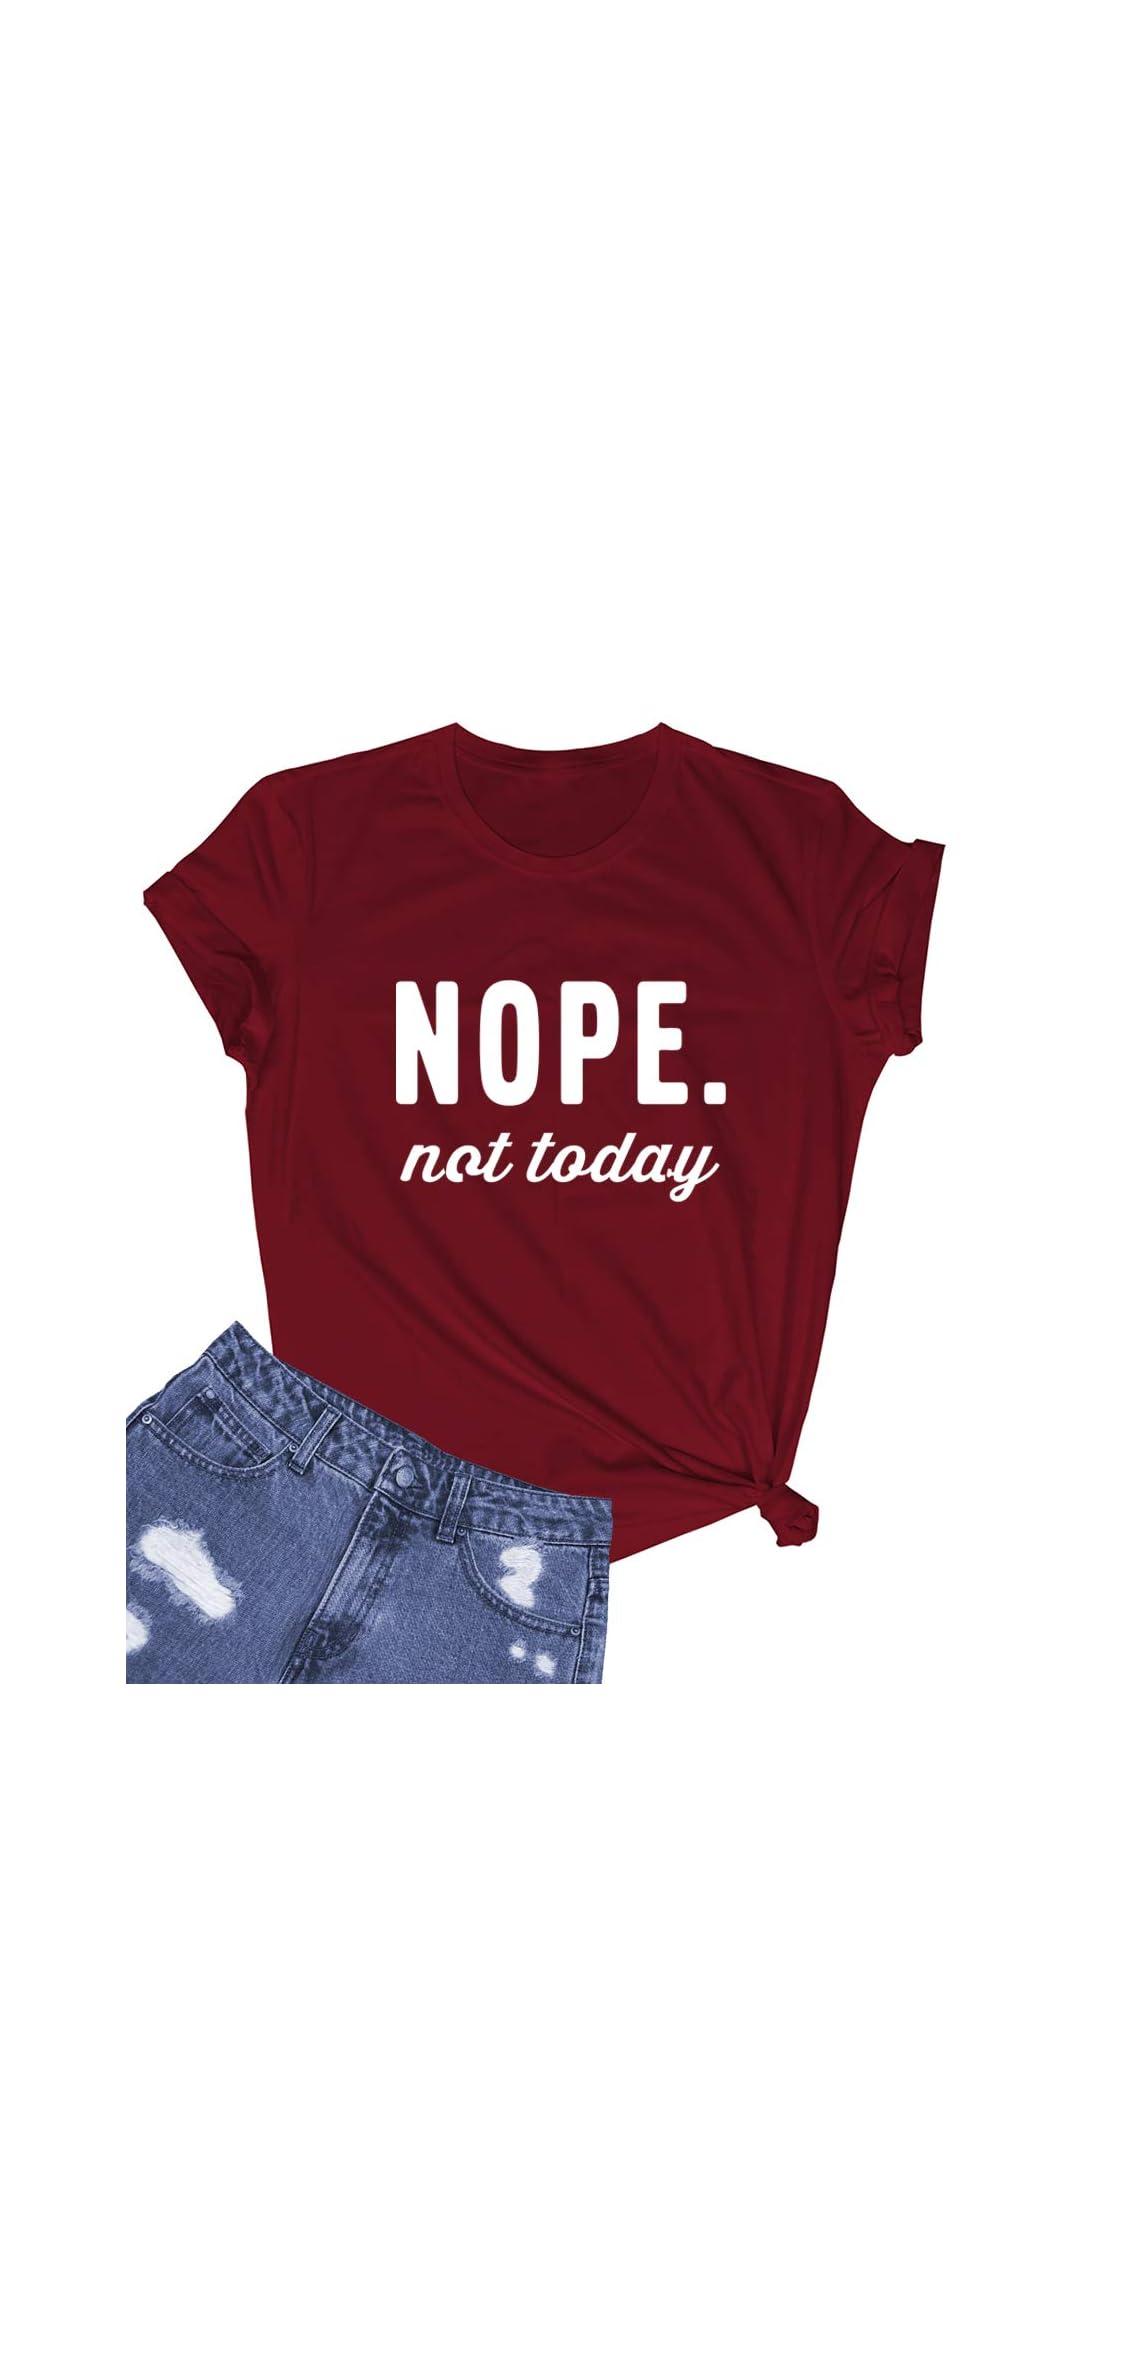 Women's Cute Juniors Tops Teen Girl Tee Funny T Shirt